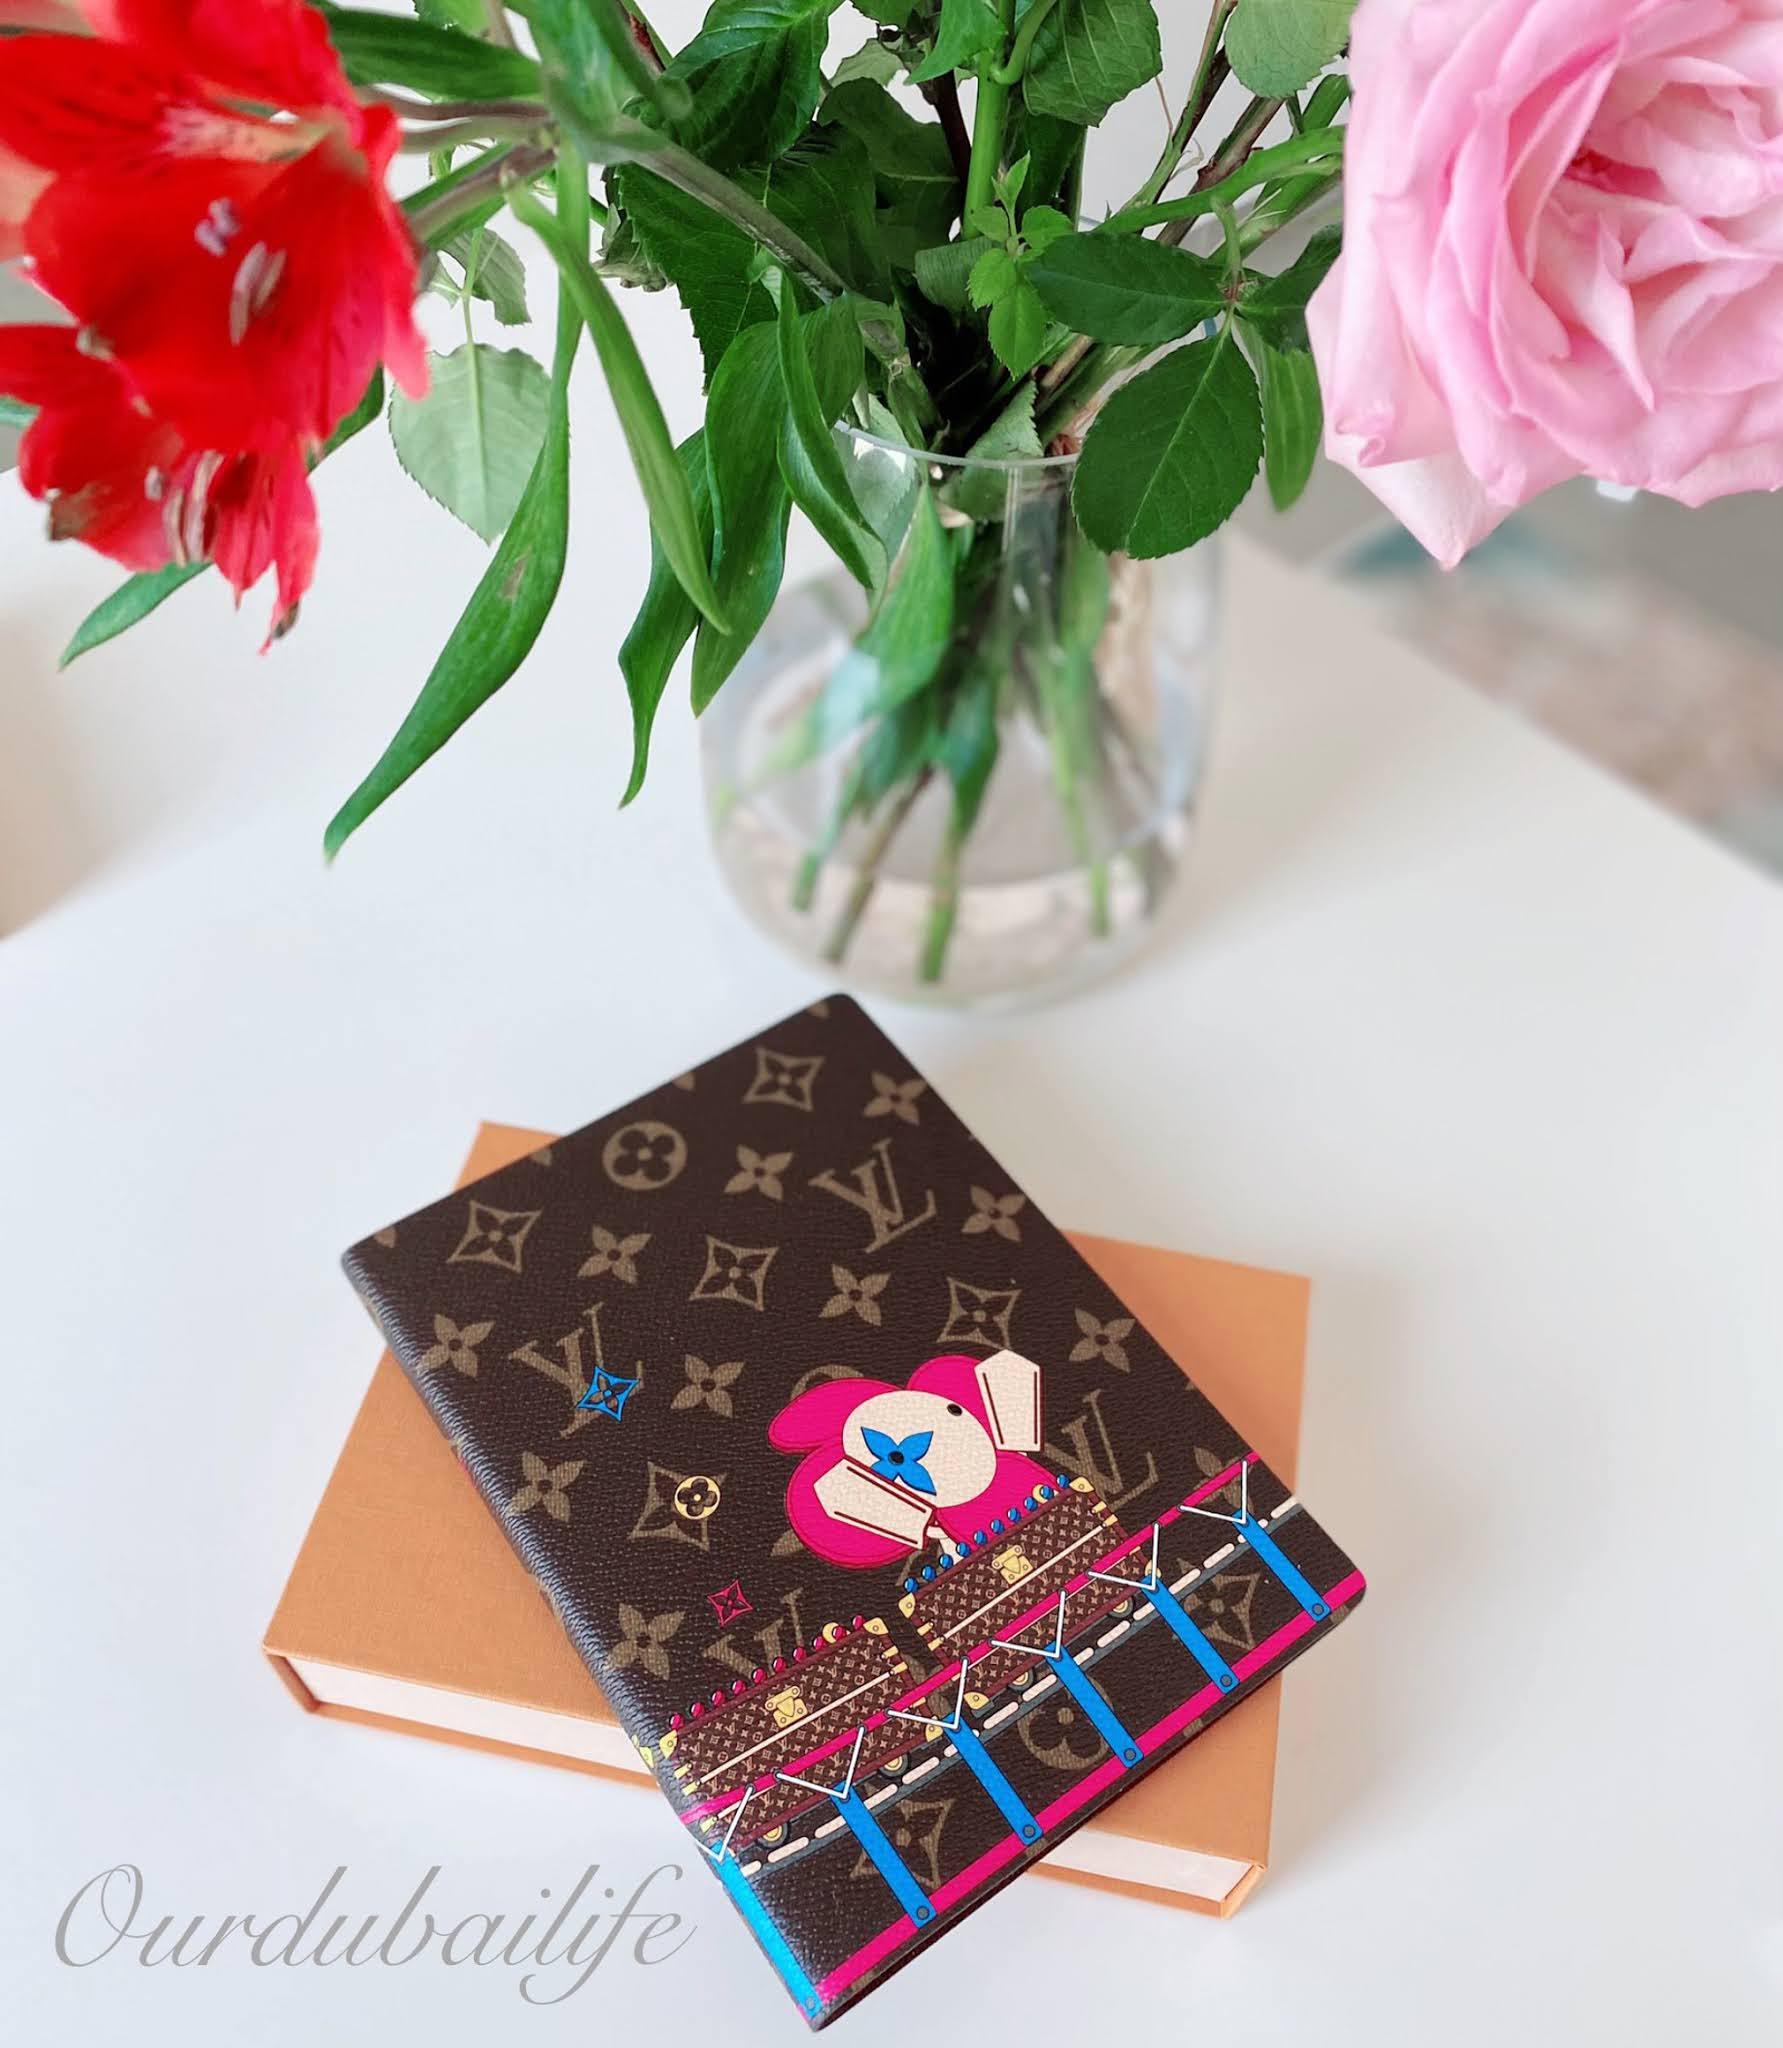 Louis Vuitton 2020 Xmas Trunk Roller Coaster Clemence Notebook